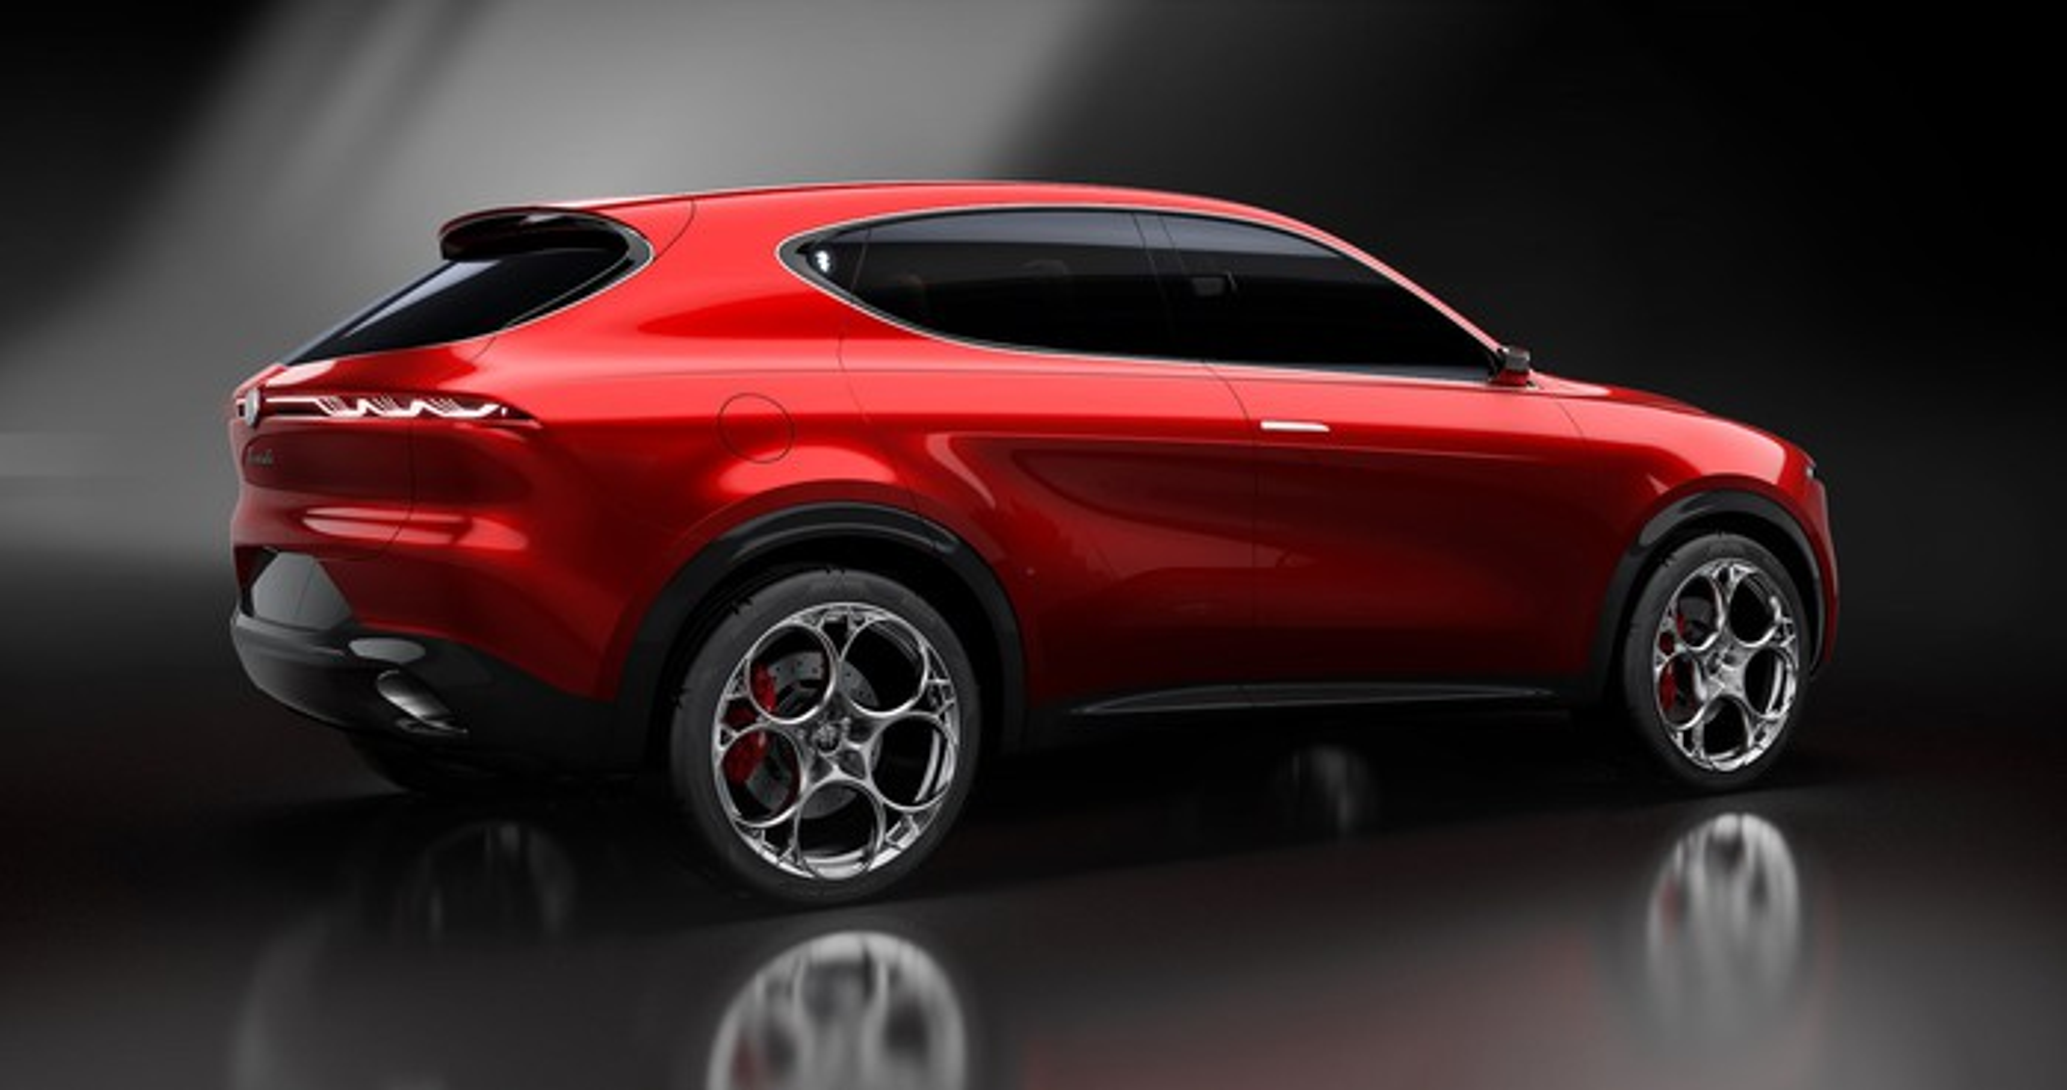 A rear three-quarter view of the Alfa Romeo Tonale Concept, a sporty red crossover SUV